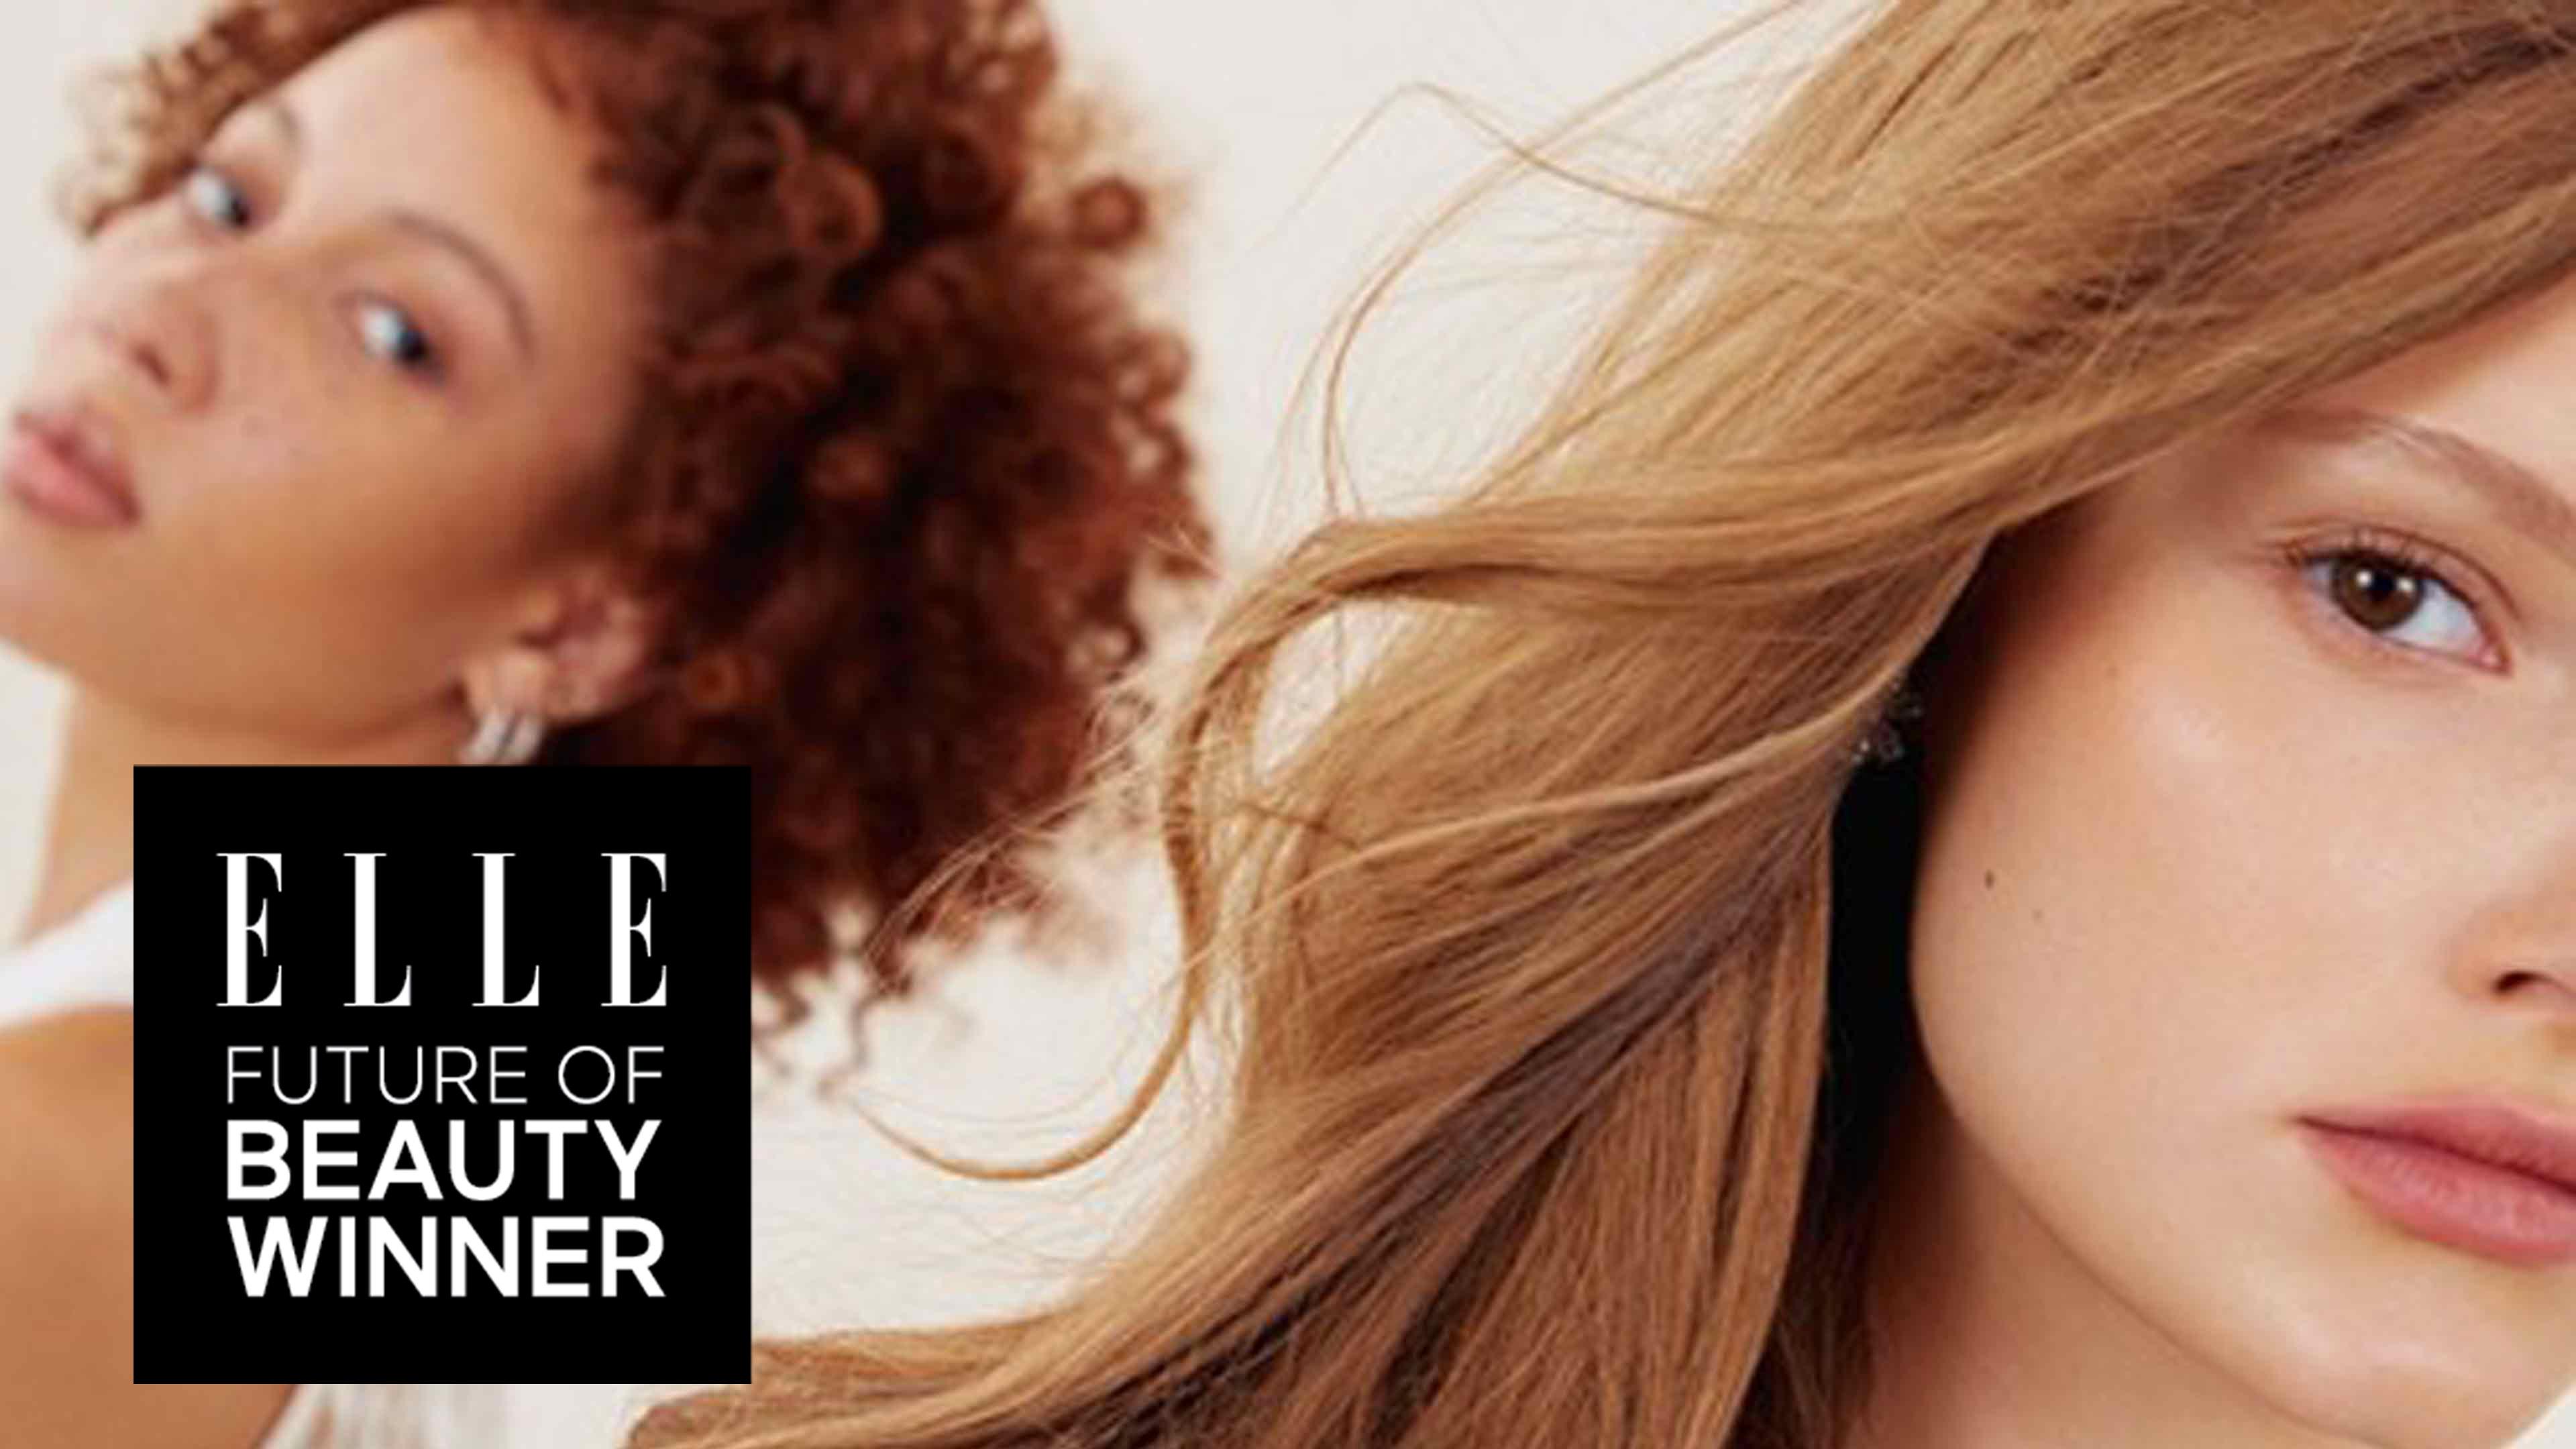 ELLE: 2019 Future of Beauty Awards